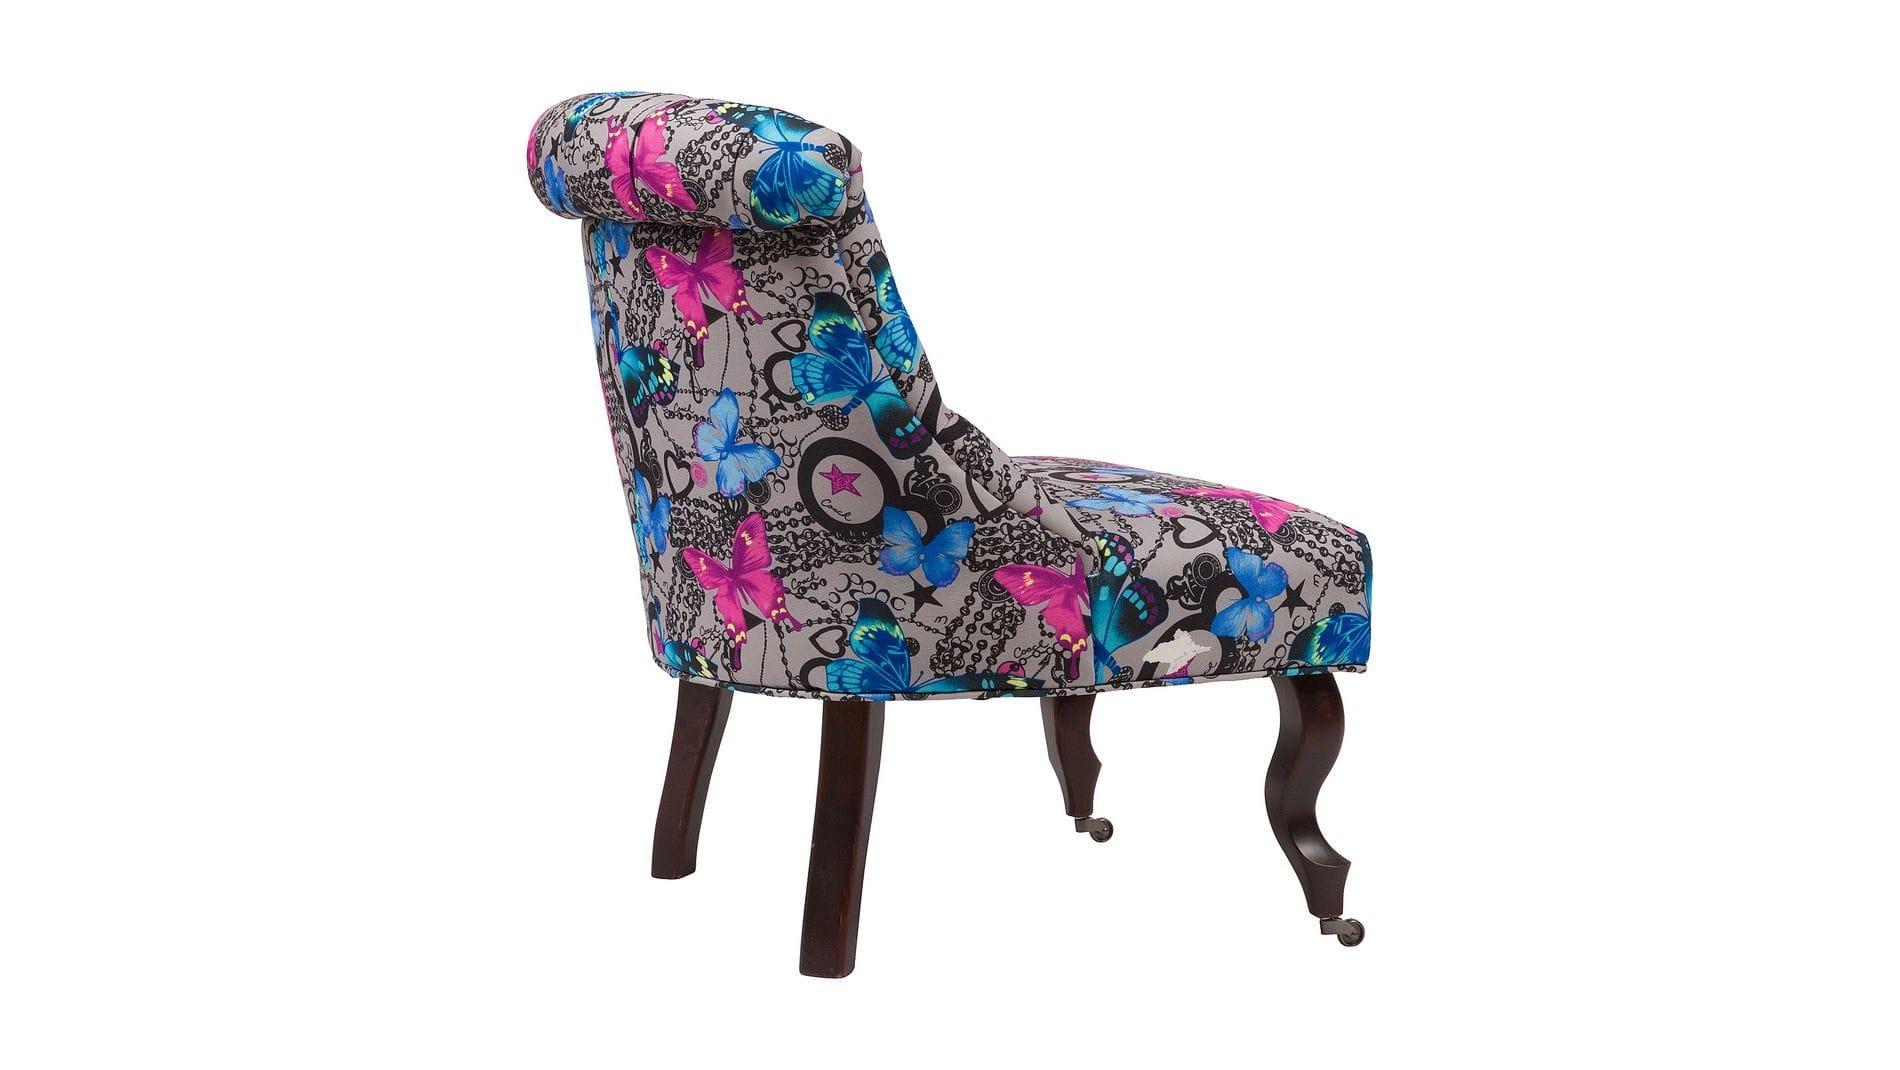 Кресло Amelie French Country Chair Бабочки М